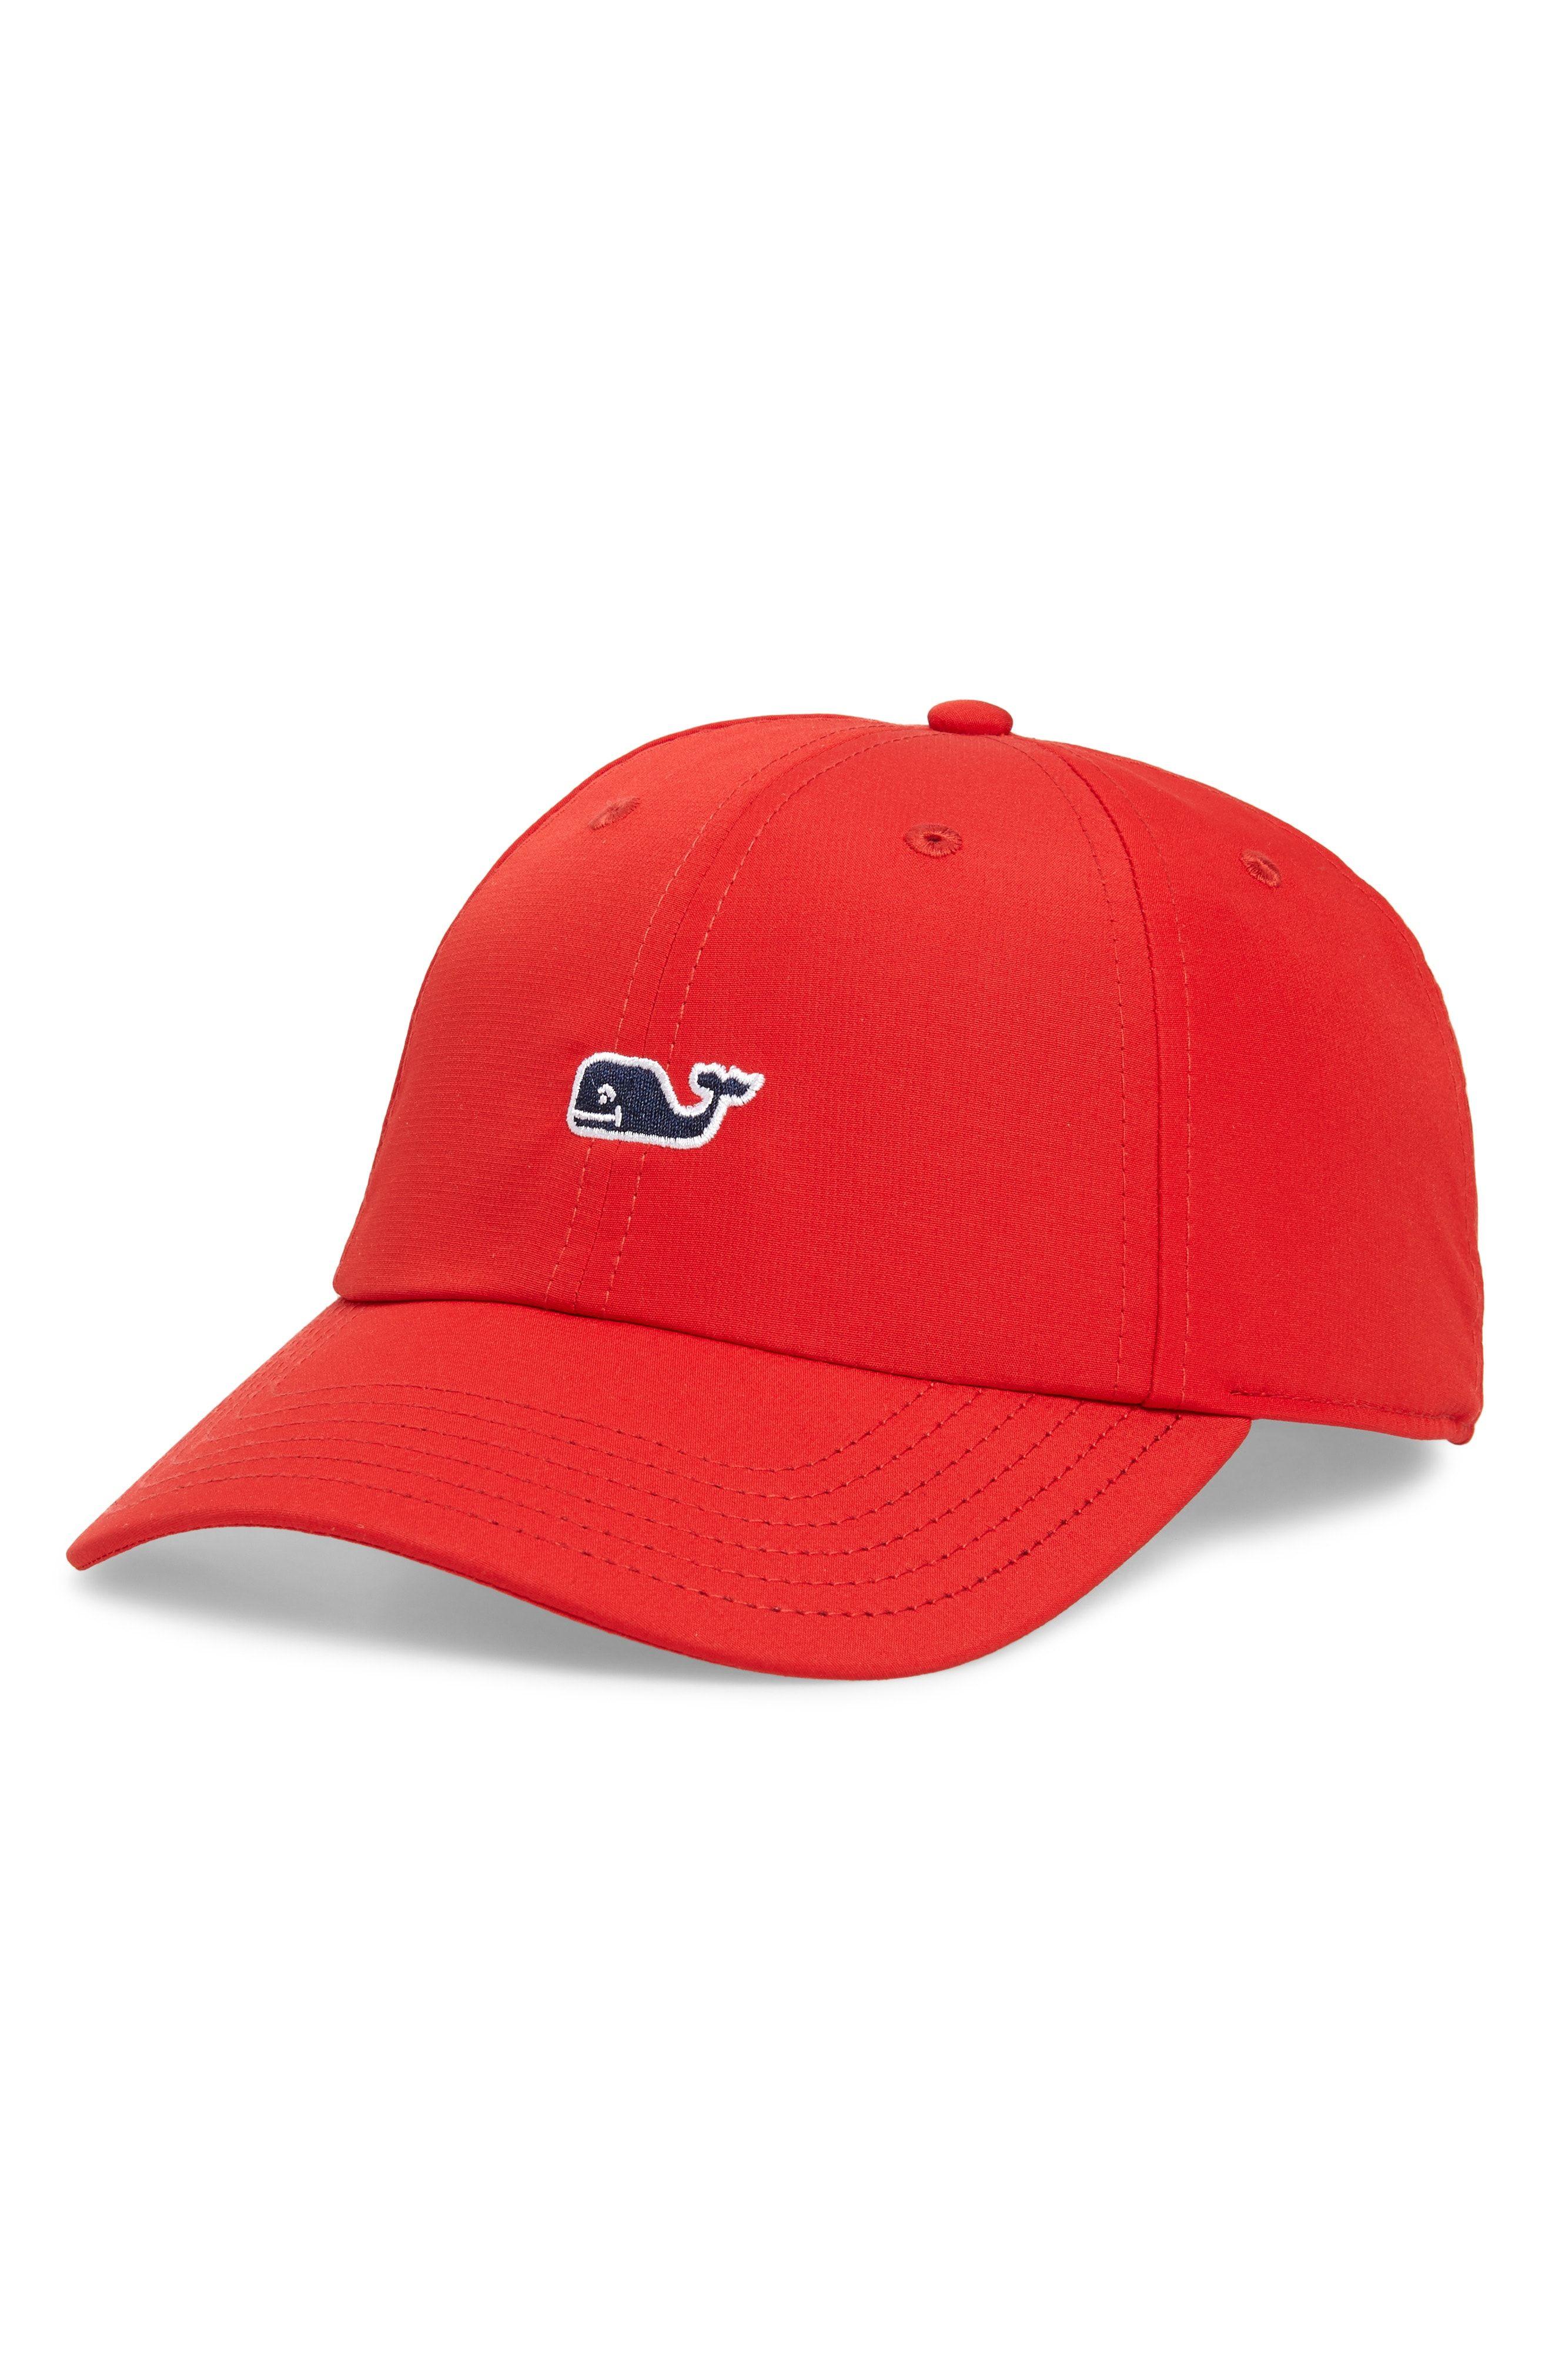 2994646bcac VINEYARD VINES WHALE LOGO BASEBALL CAP - RED. #vineyardvines ...